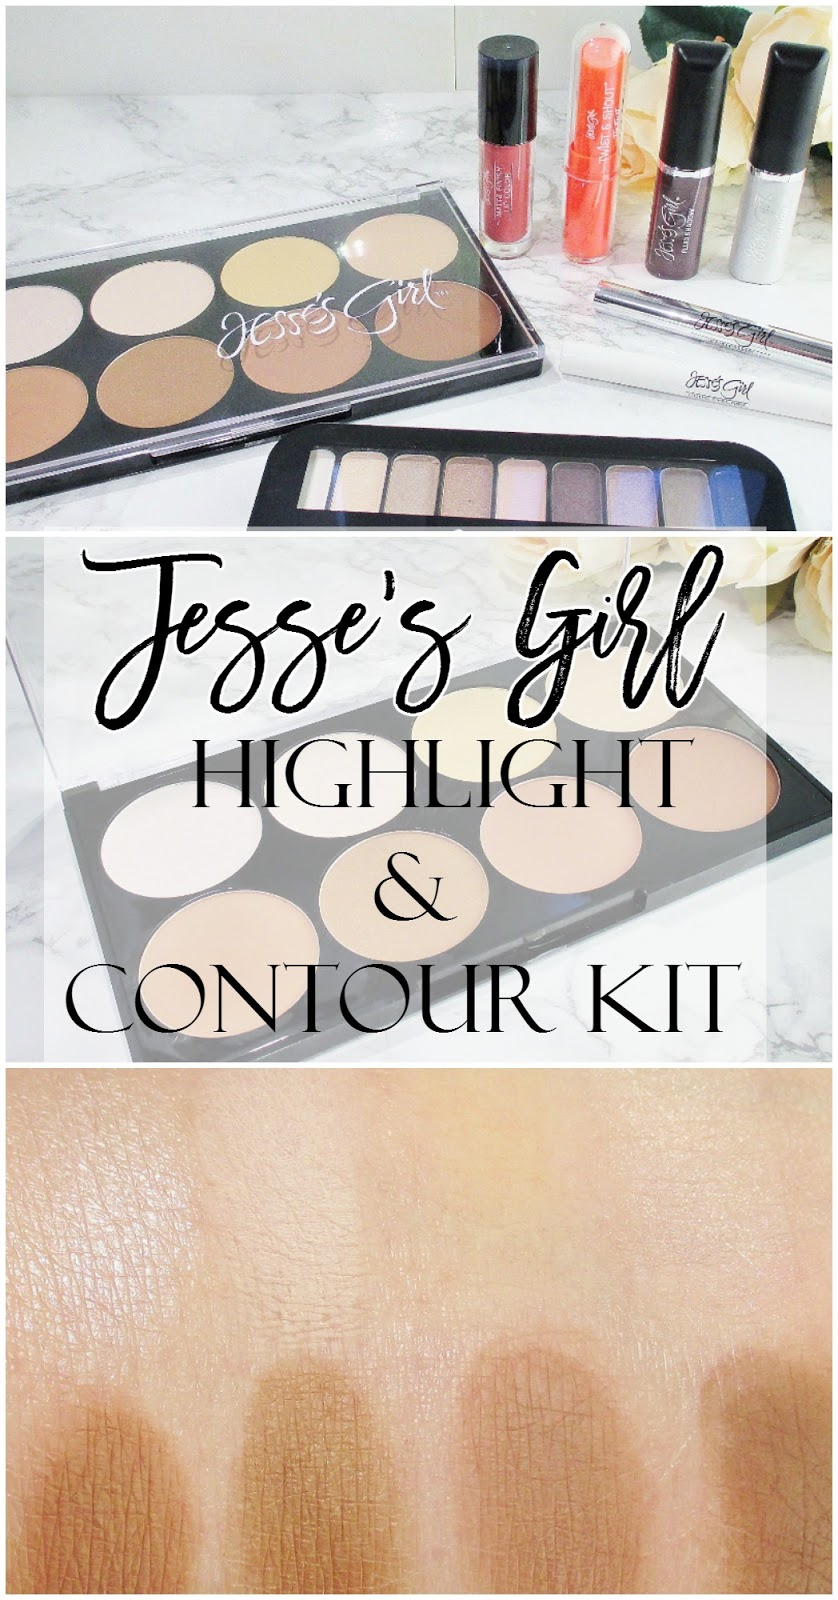 jesses-girl-cosmetics-contour-and-highlight-kit--